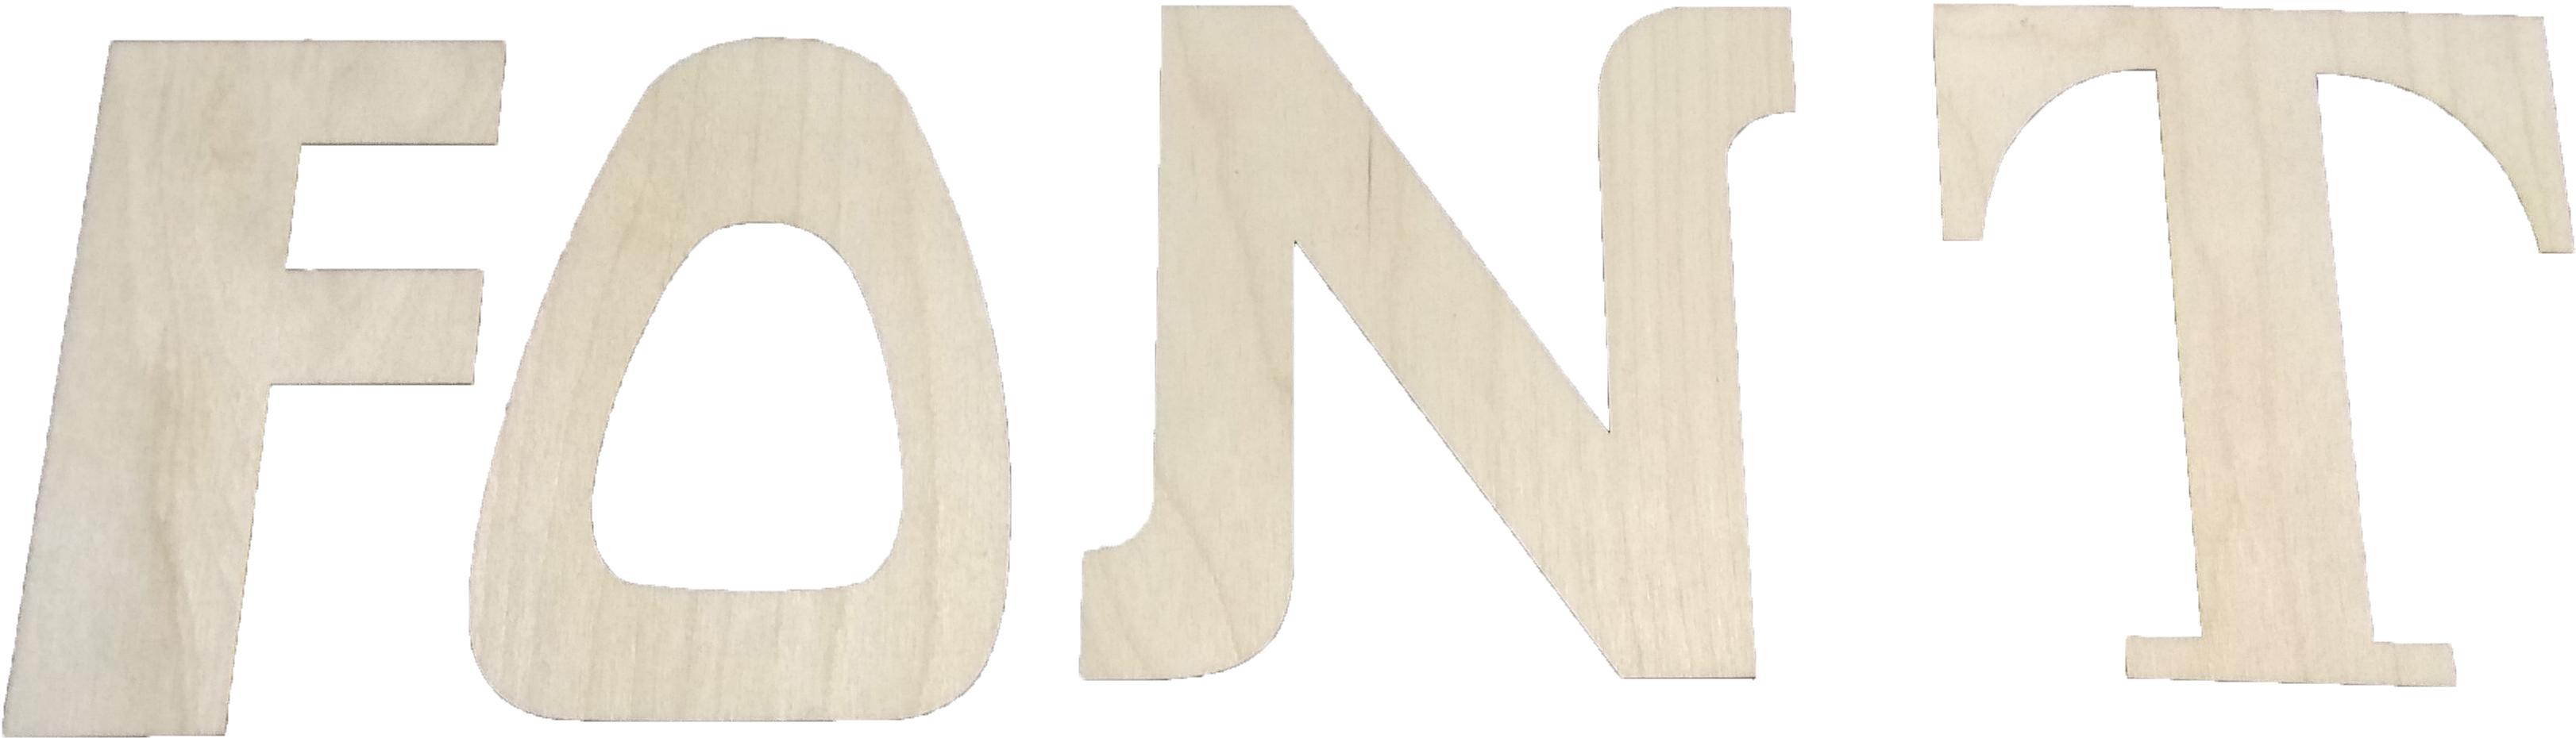 Лазерная резка букв